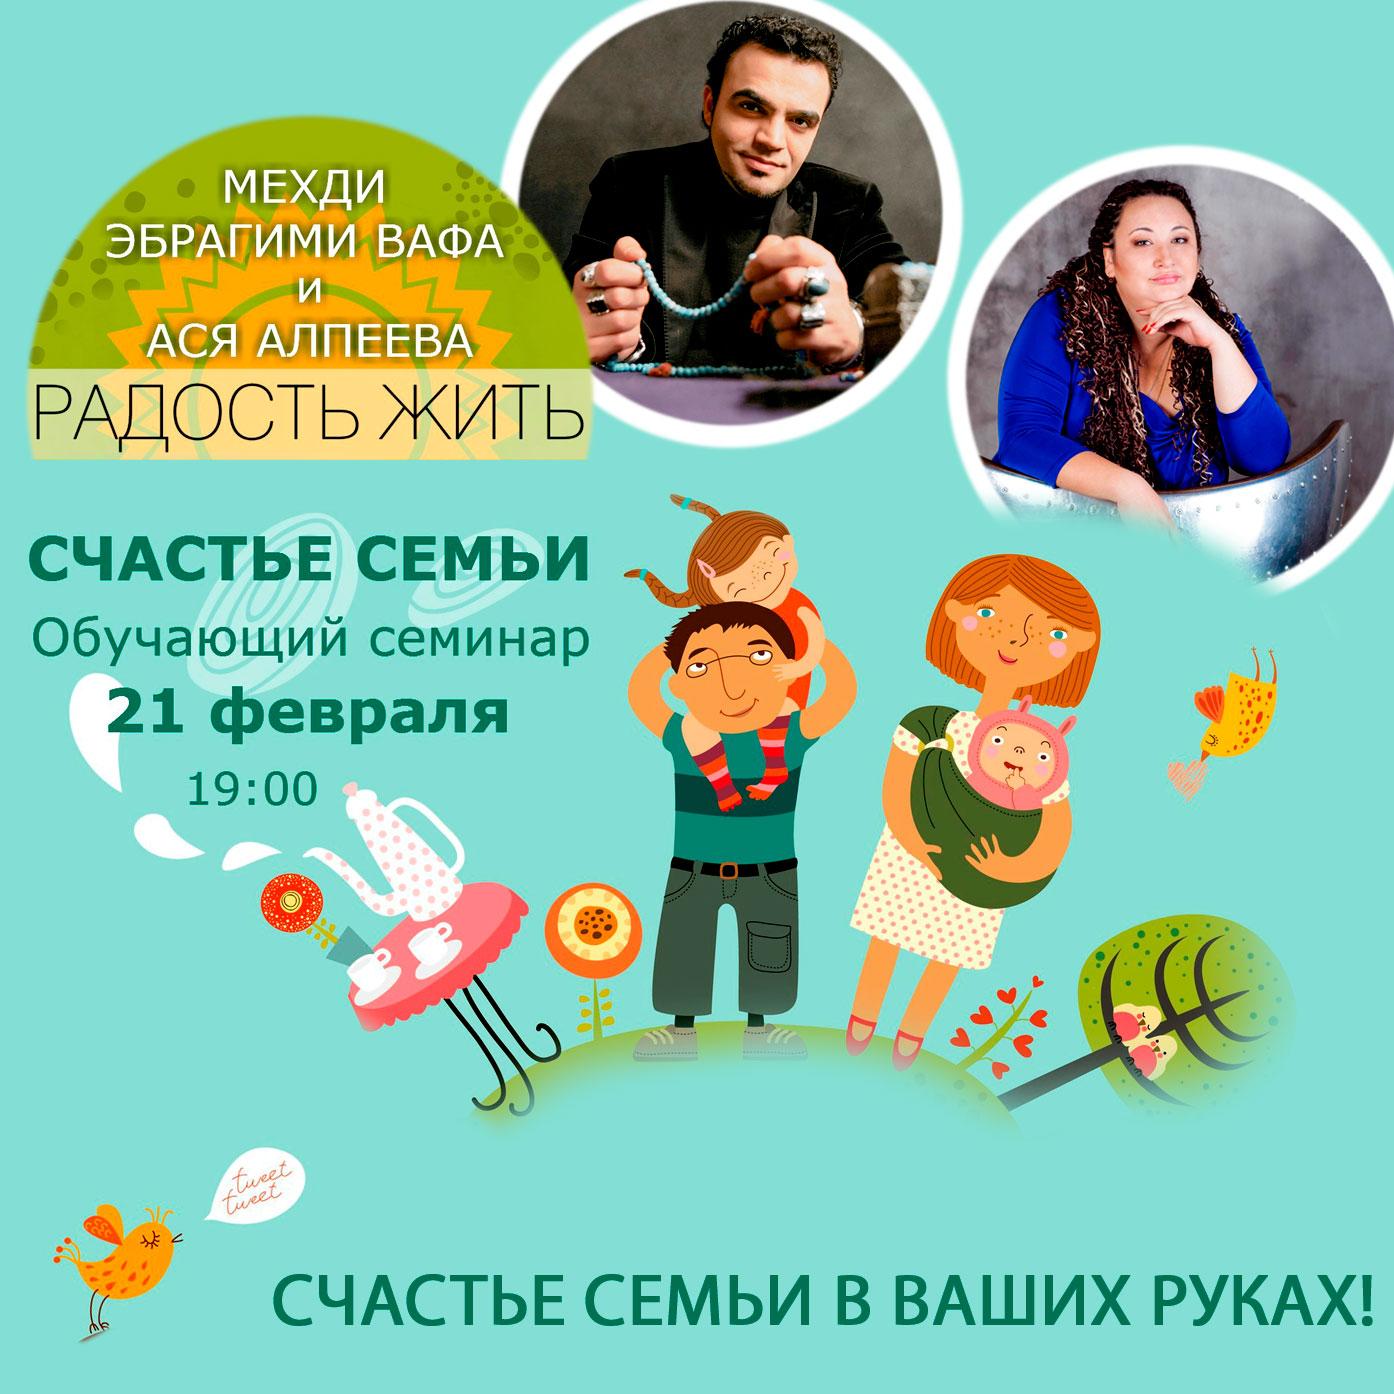 schastie-semyi-seminar-mehdi-asya